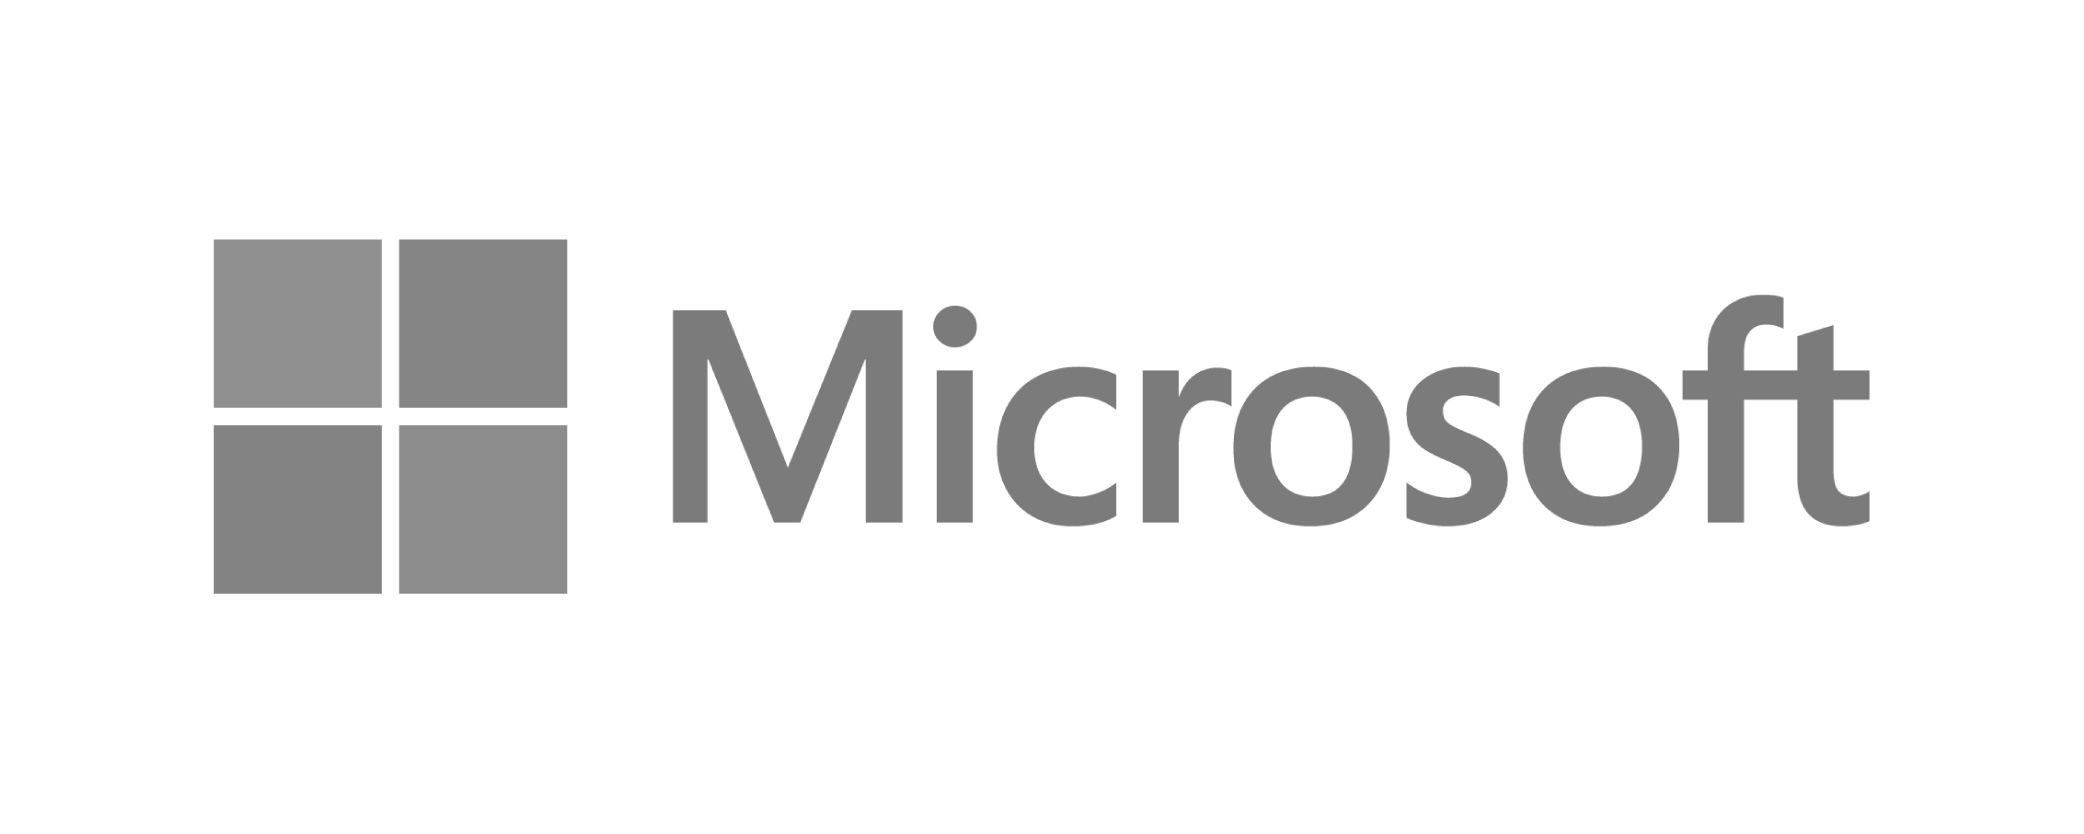 Microsoft Grey 500 x 200-01.jpg